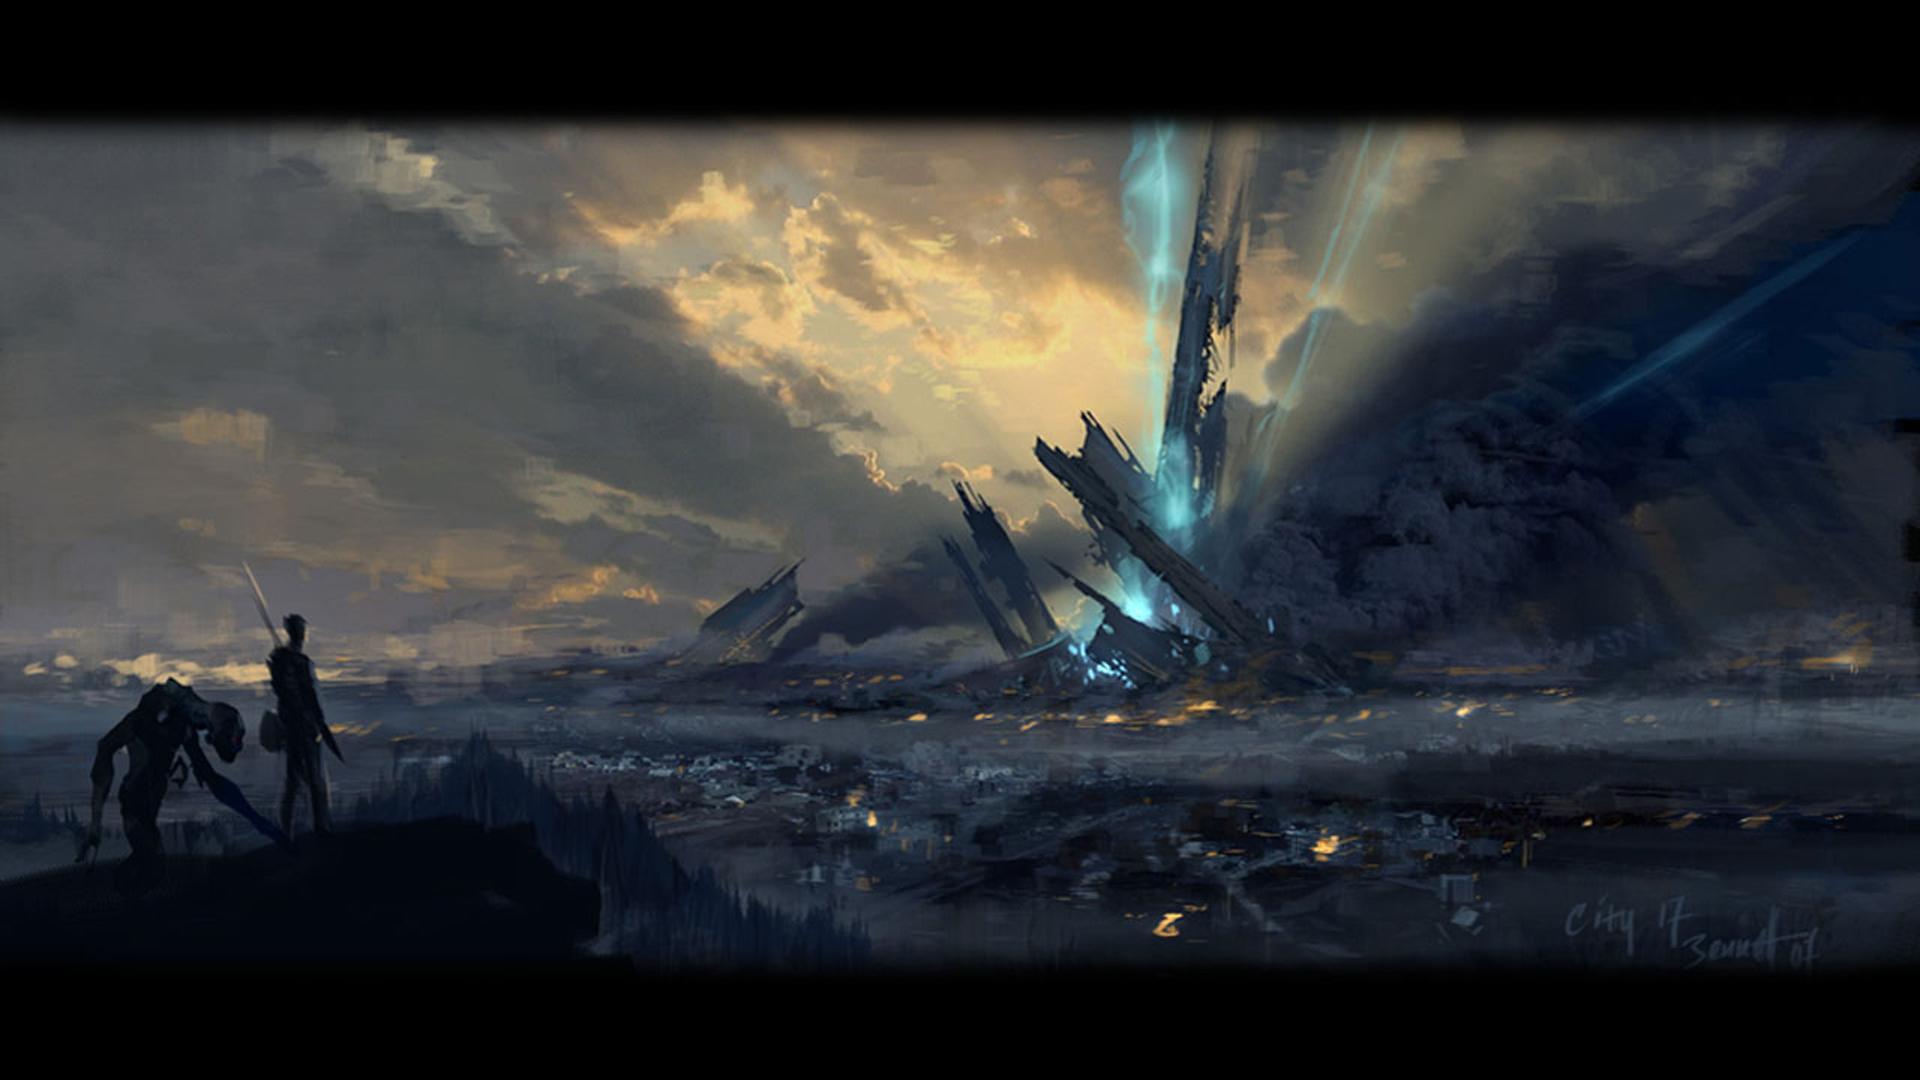 Half Life 2 Art 472869 Hd Wallpaper Backgrounds Download